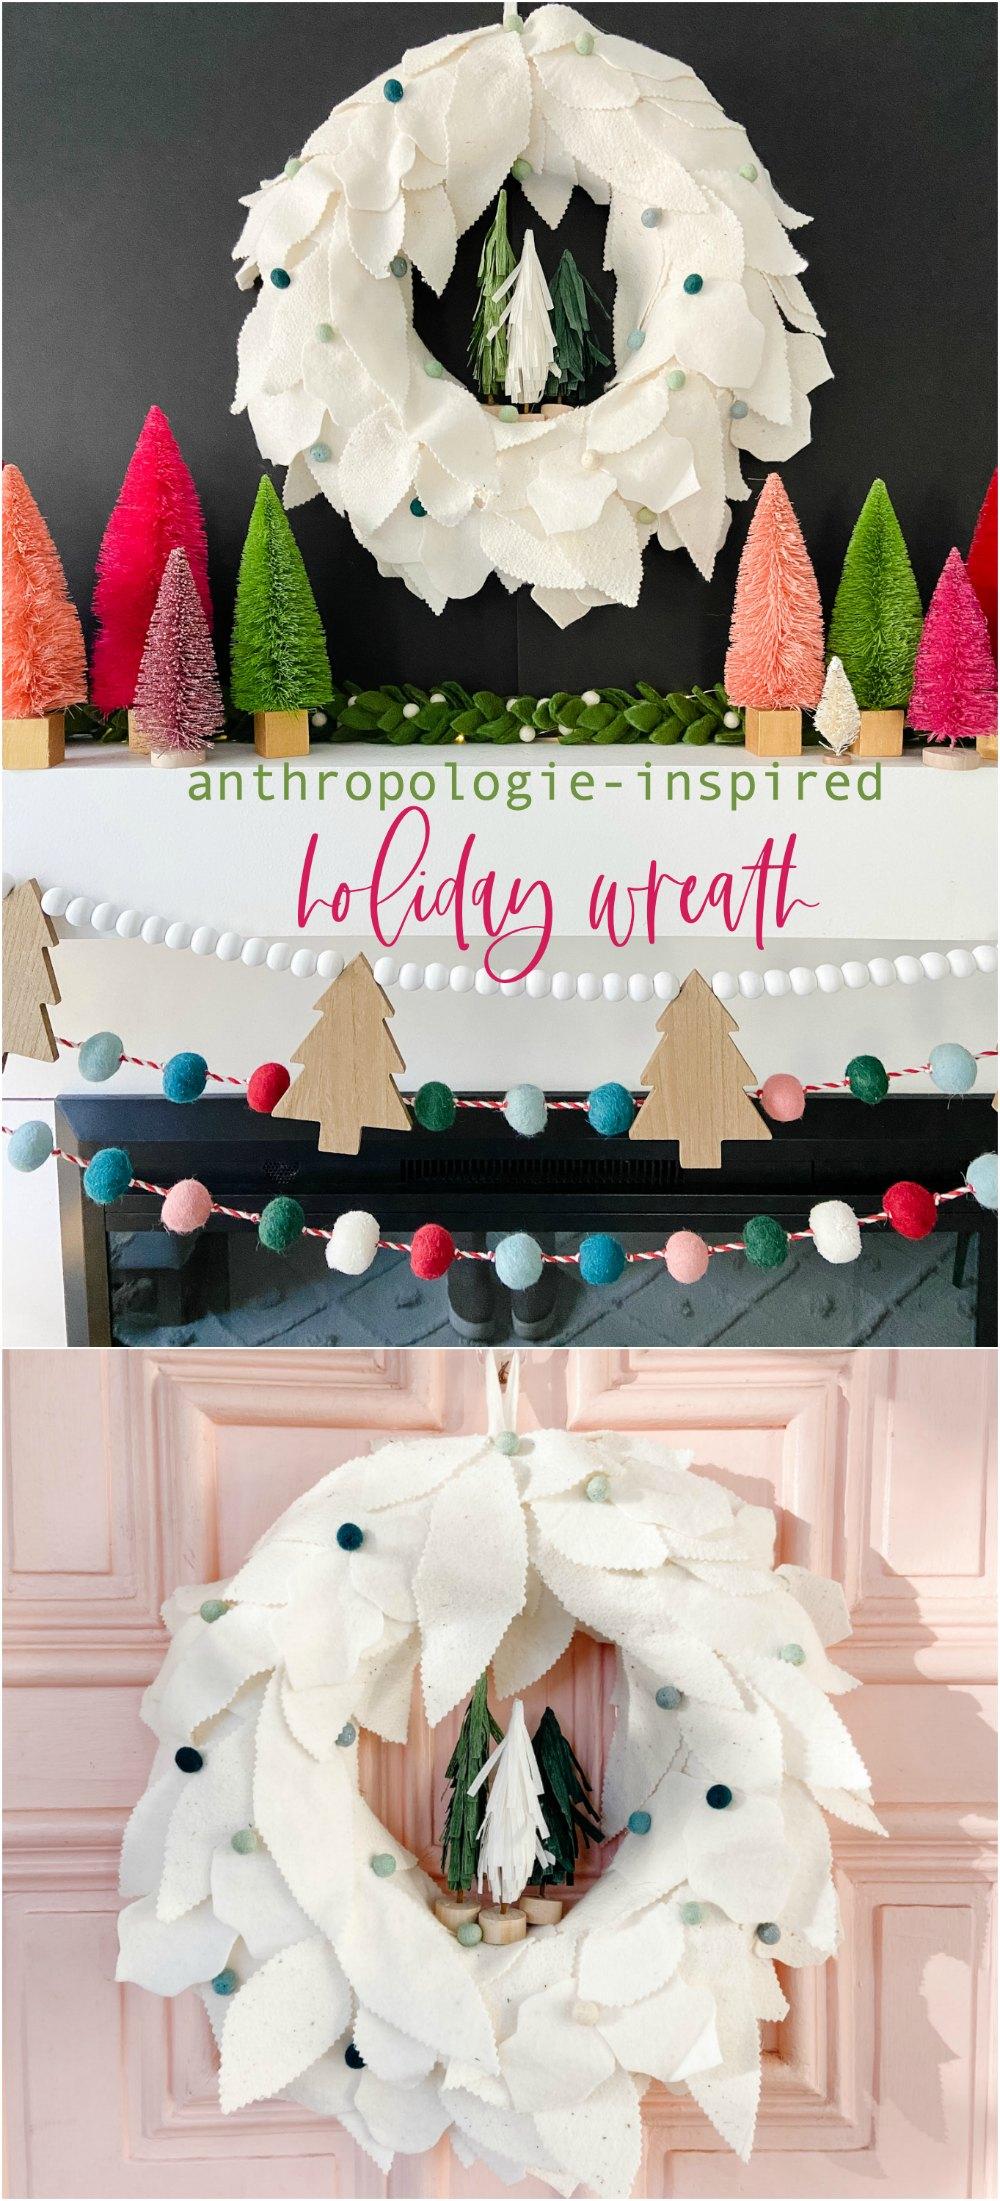 Anthropologie-inspired felt holiday leaf wreath